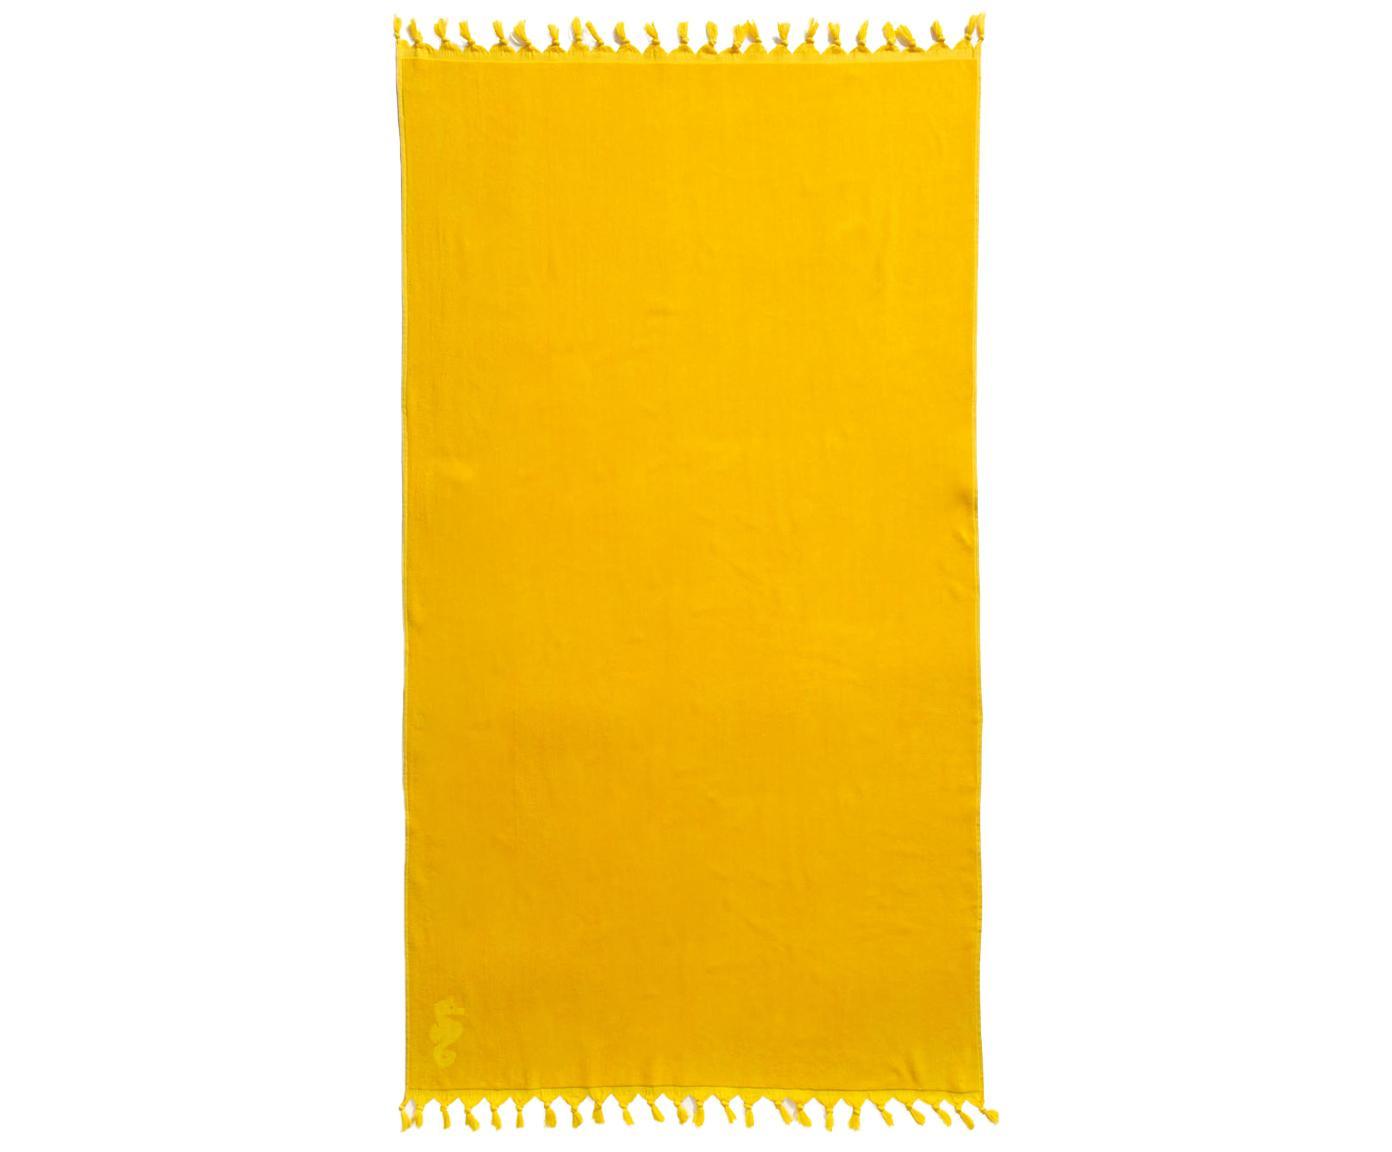 Hamamdoek Lushie, Katoen, middelzware stofkwaliteit, 355g/m², Zonnegeel, 100 x 180 cm